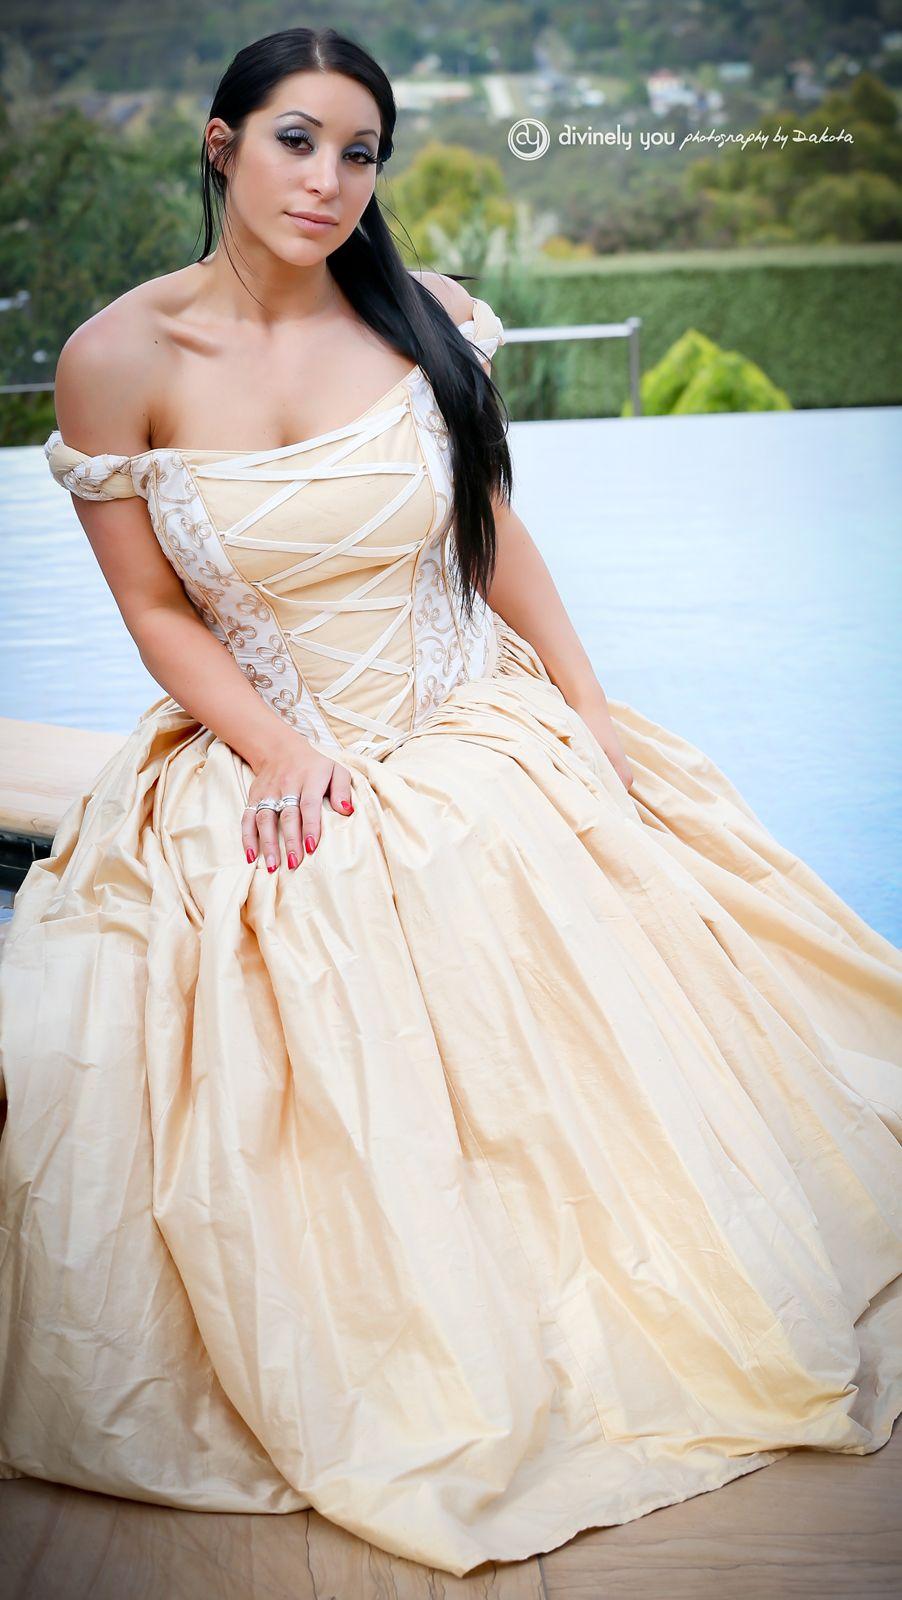 steampunk wedding dresses STEAMPUNK WEDDING GOWNS Steampunk Wedding and Formal Gowns